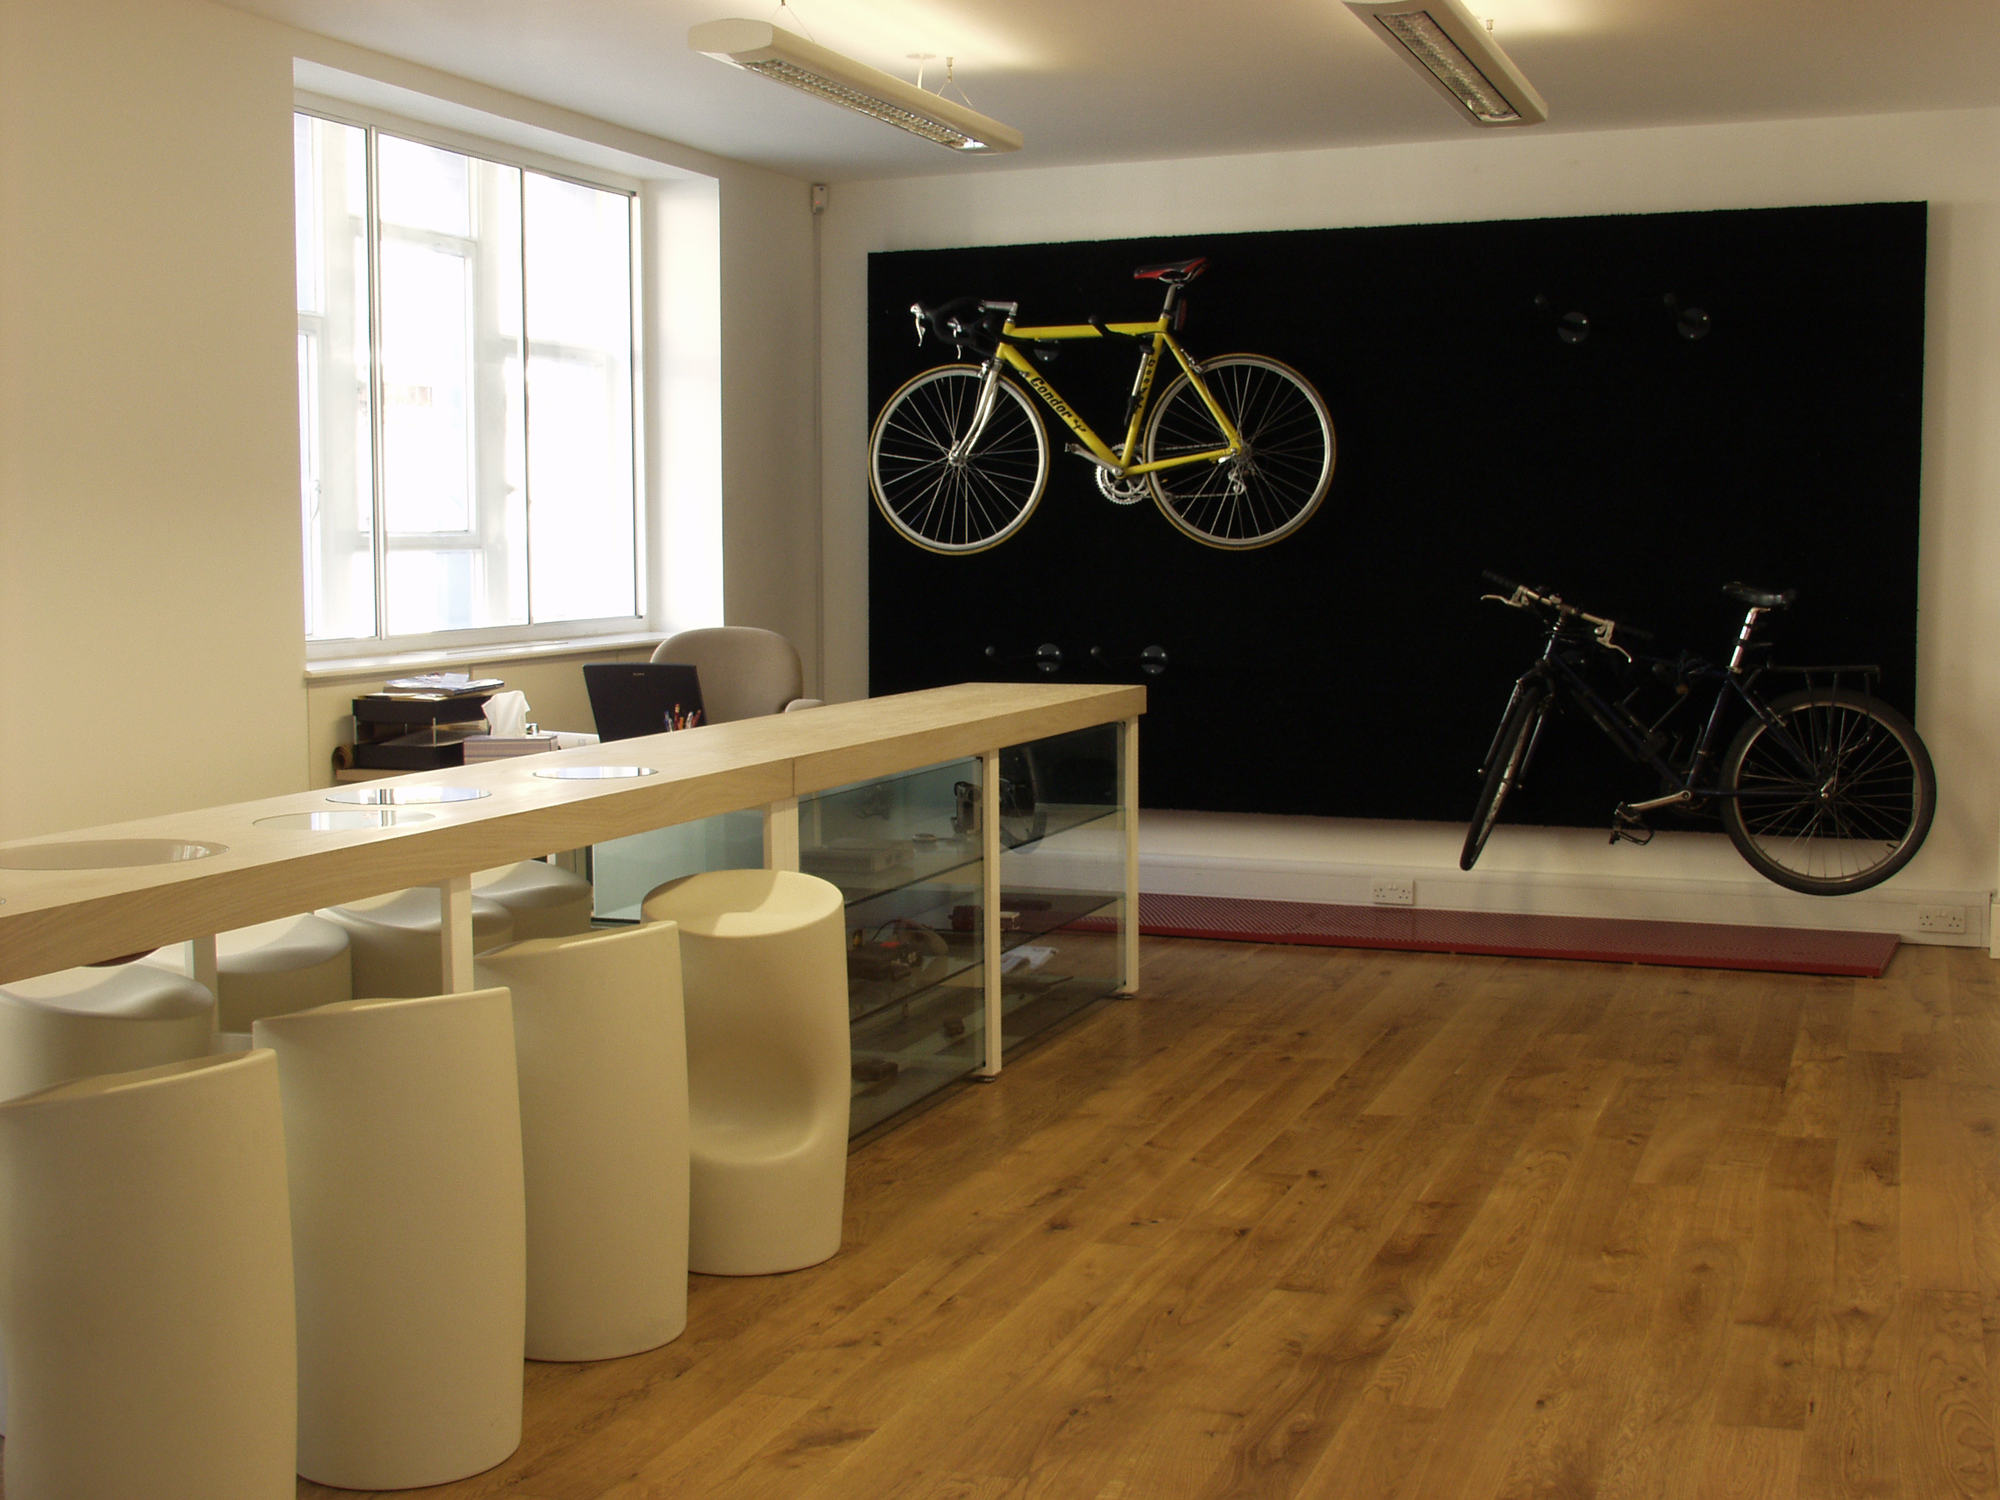 Project: Office Bike Storage